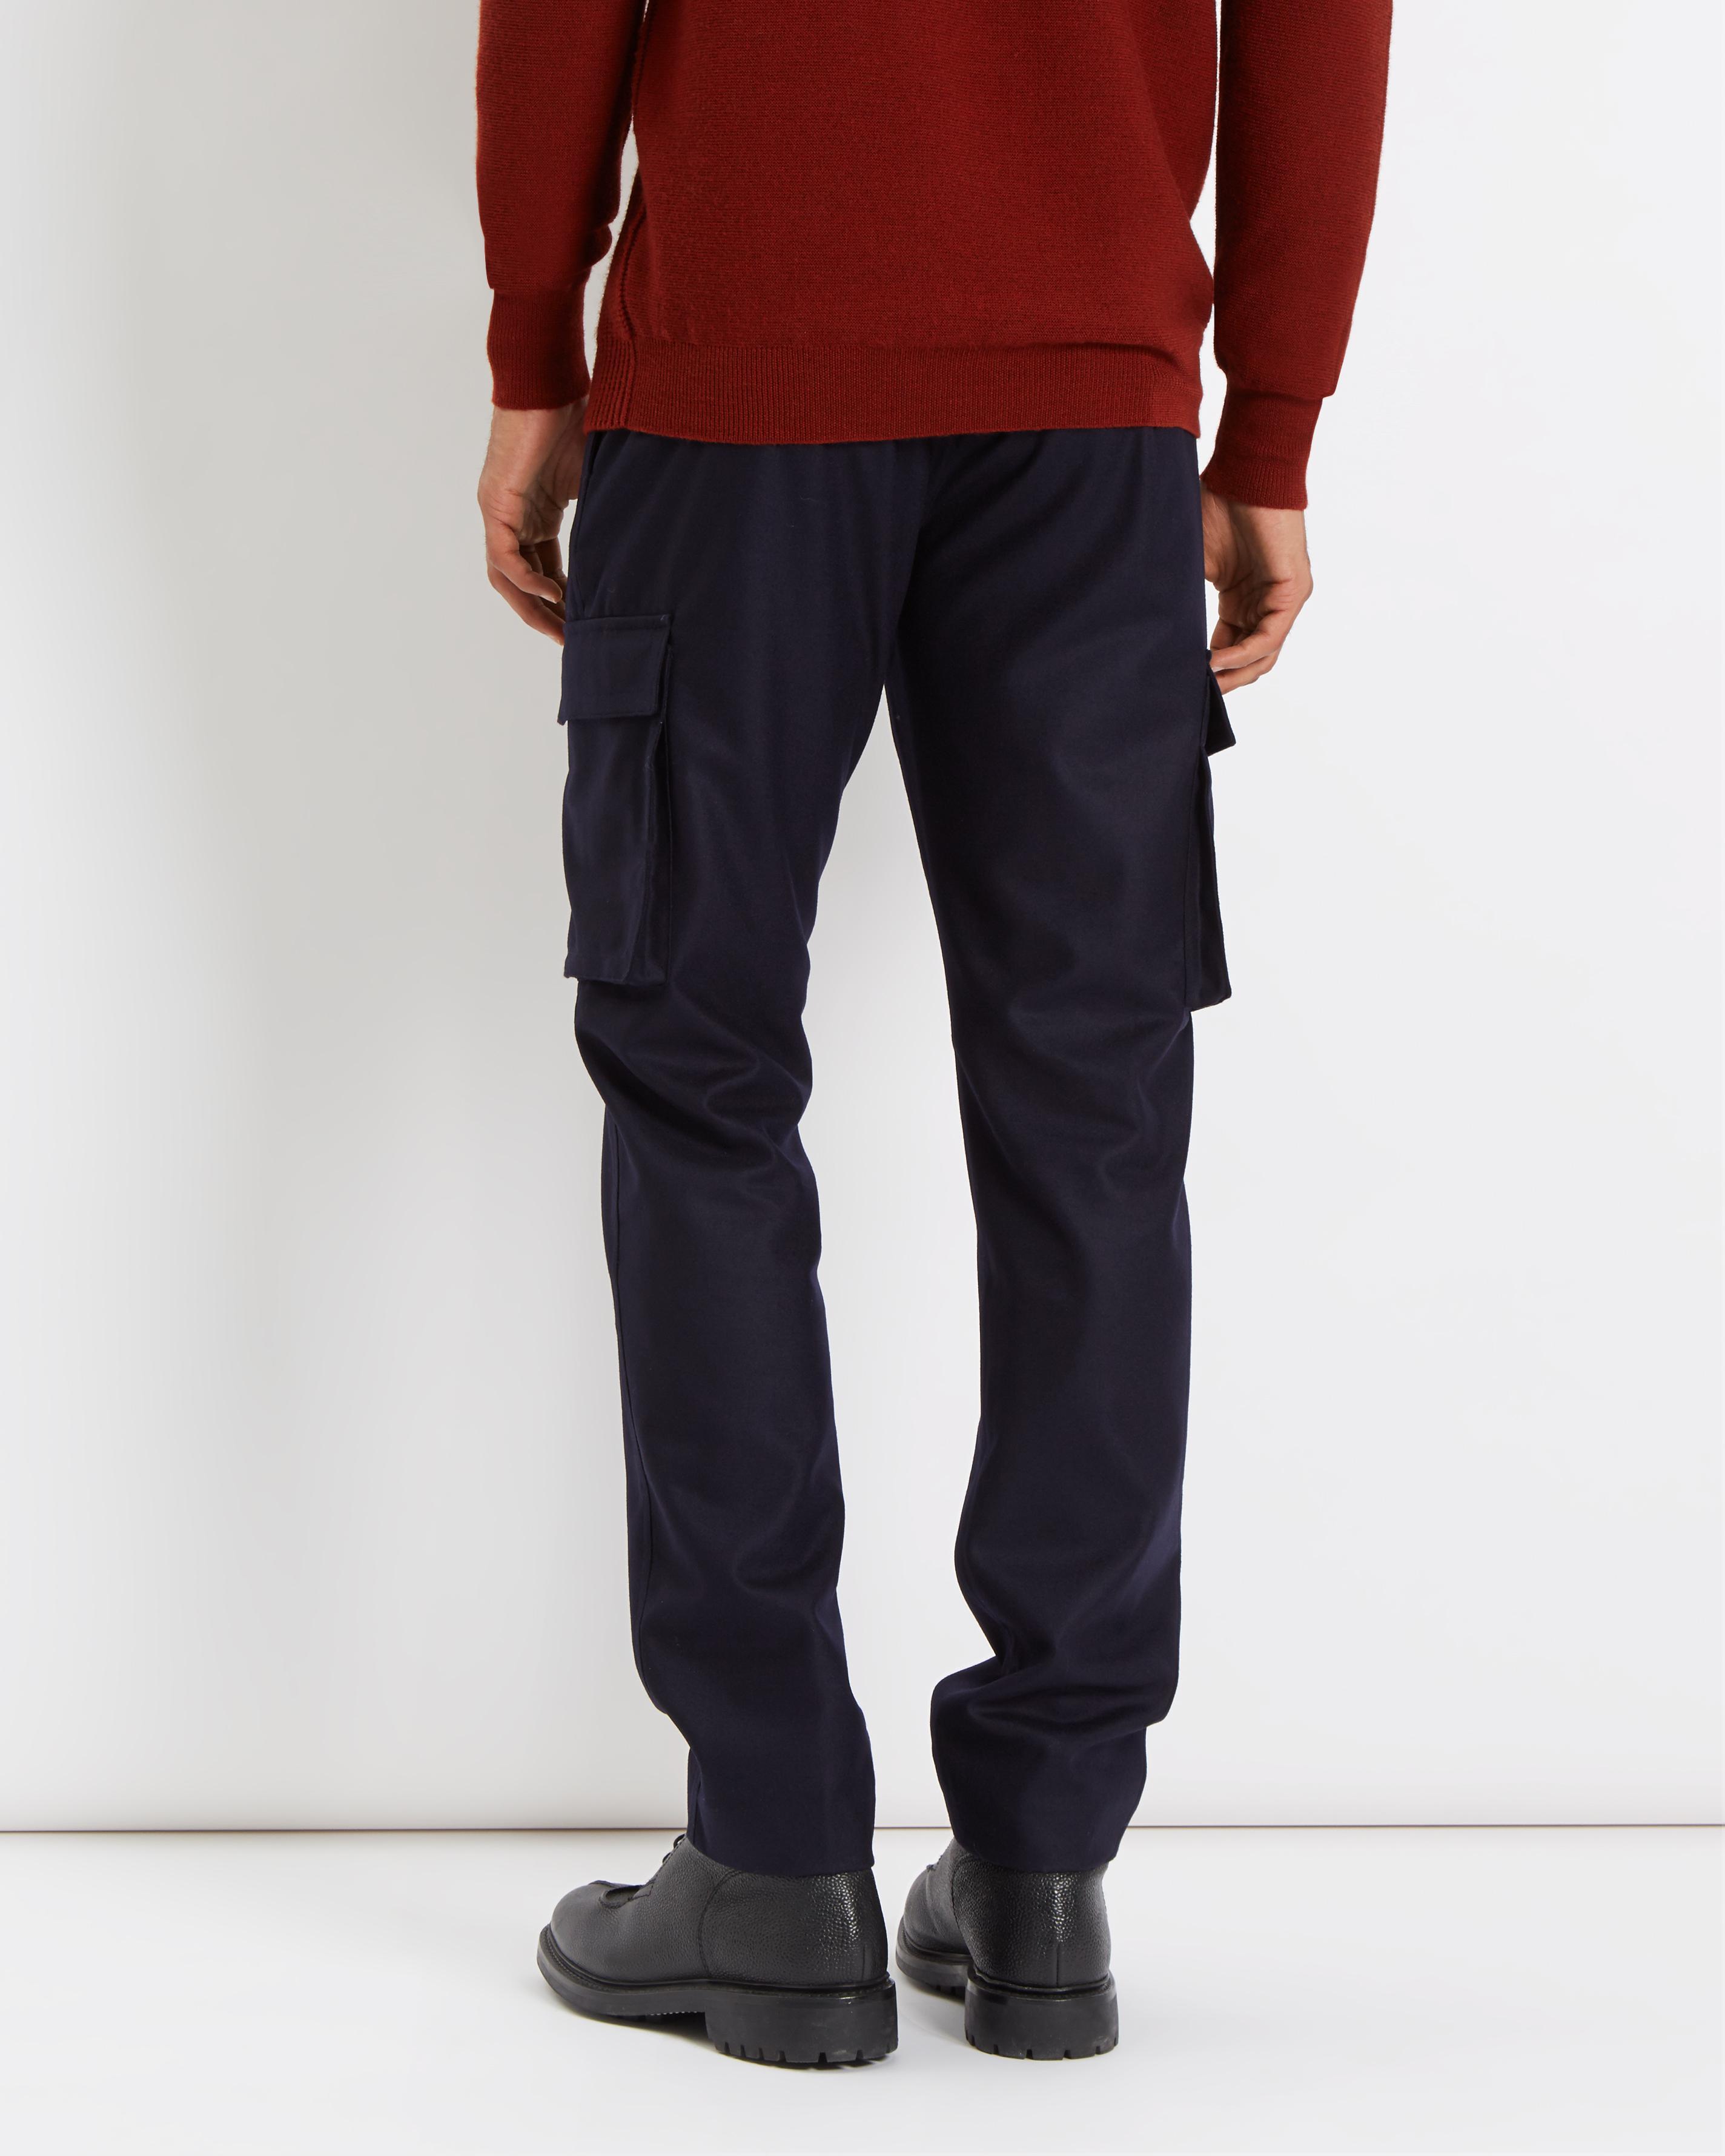 Jaeger Cotton Lou Dalton Cargo Trousers in Navy (Blue) for Men